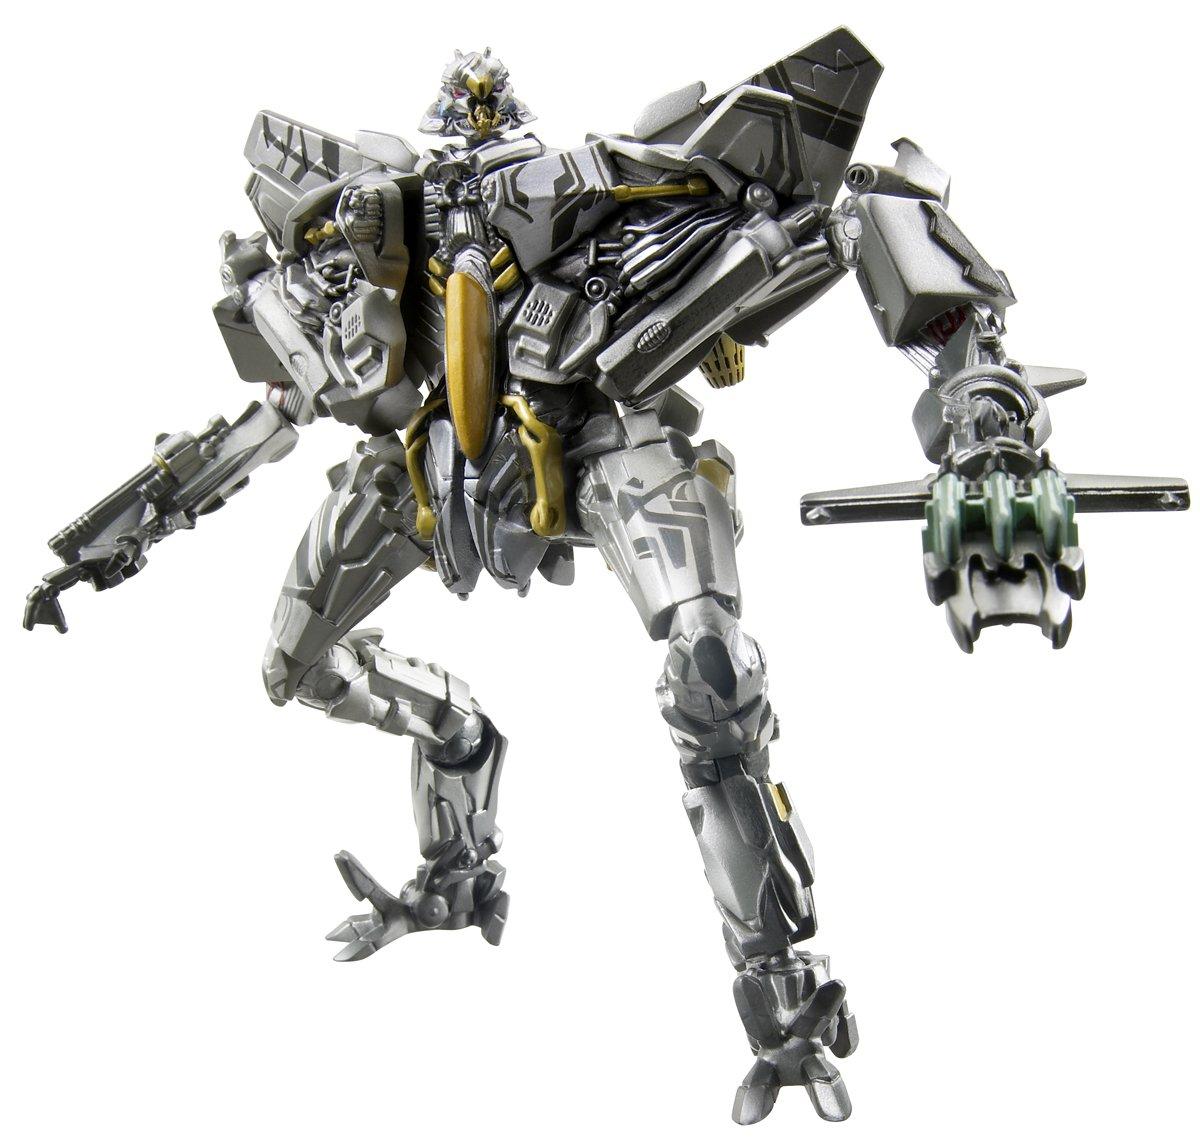 Starscream - ROTF Robot Replicas - TFW2005